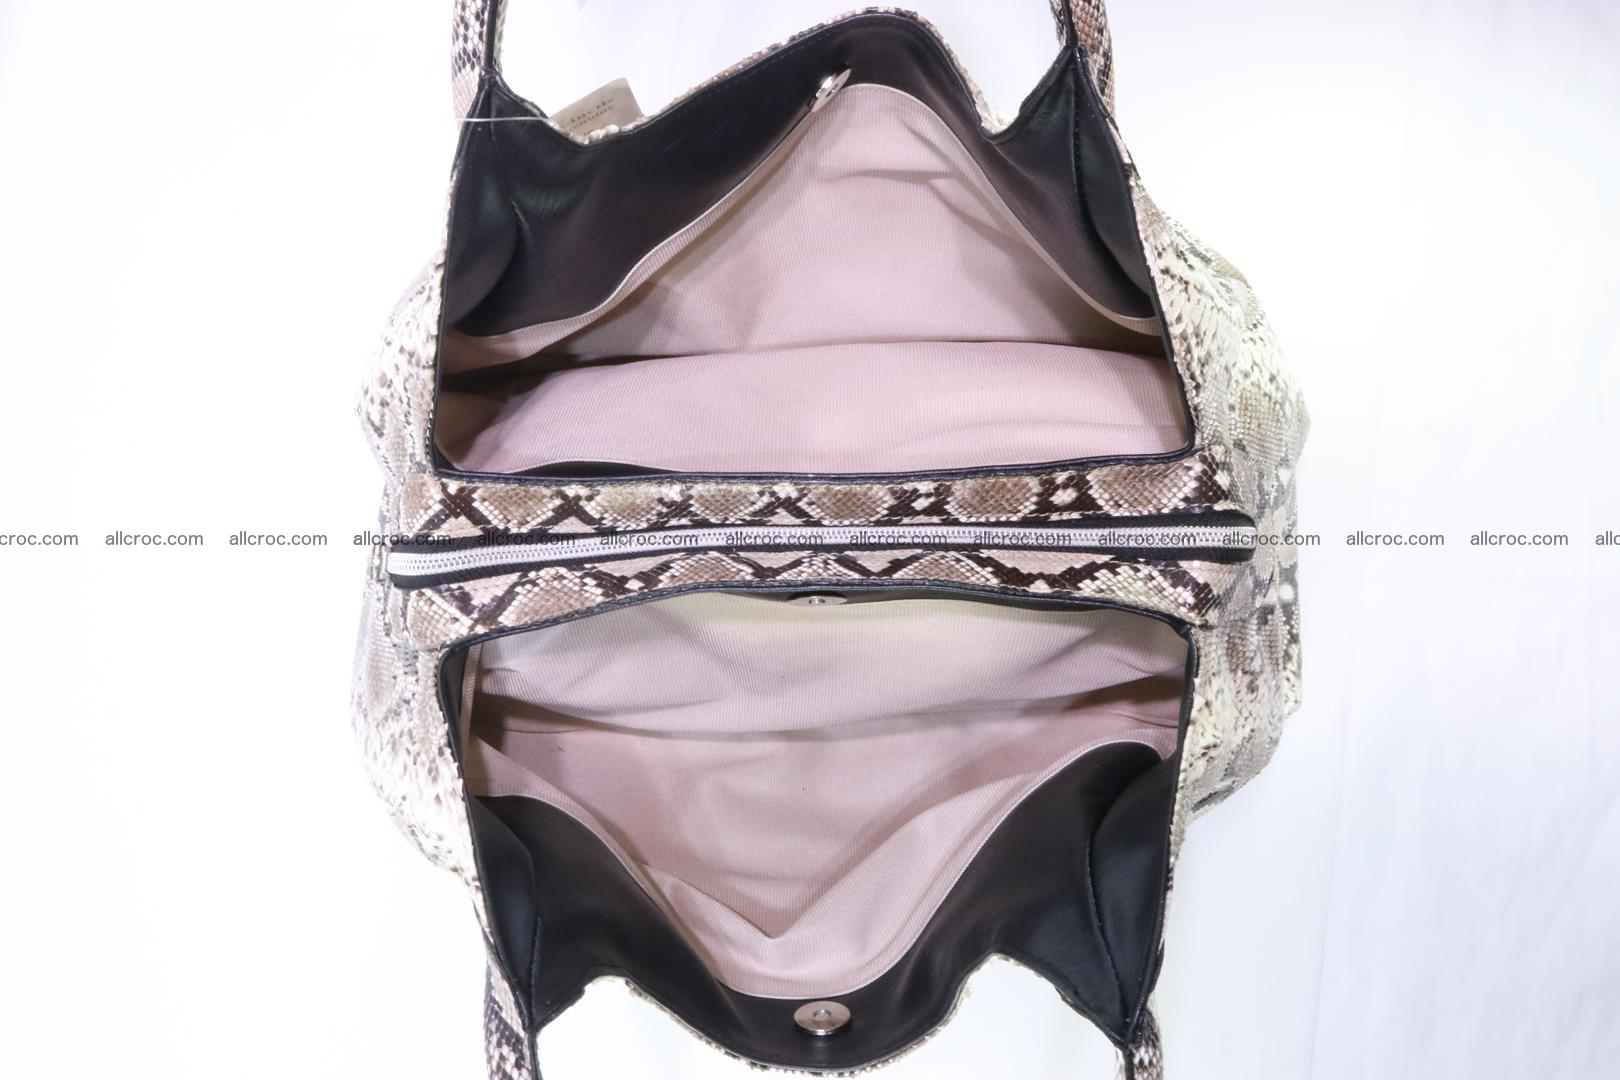 Python skin handbag for lady from genuine Python skin 197 Foto 8